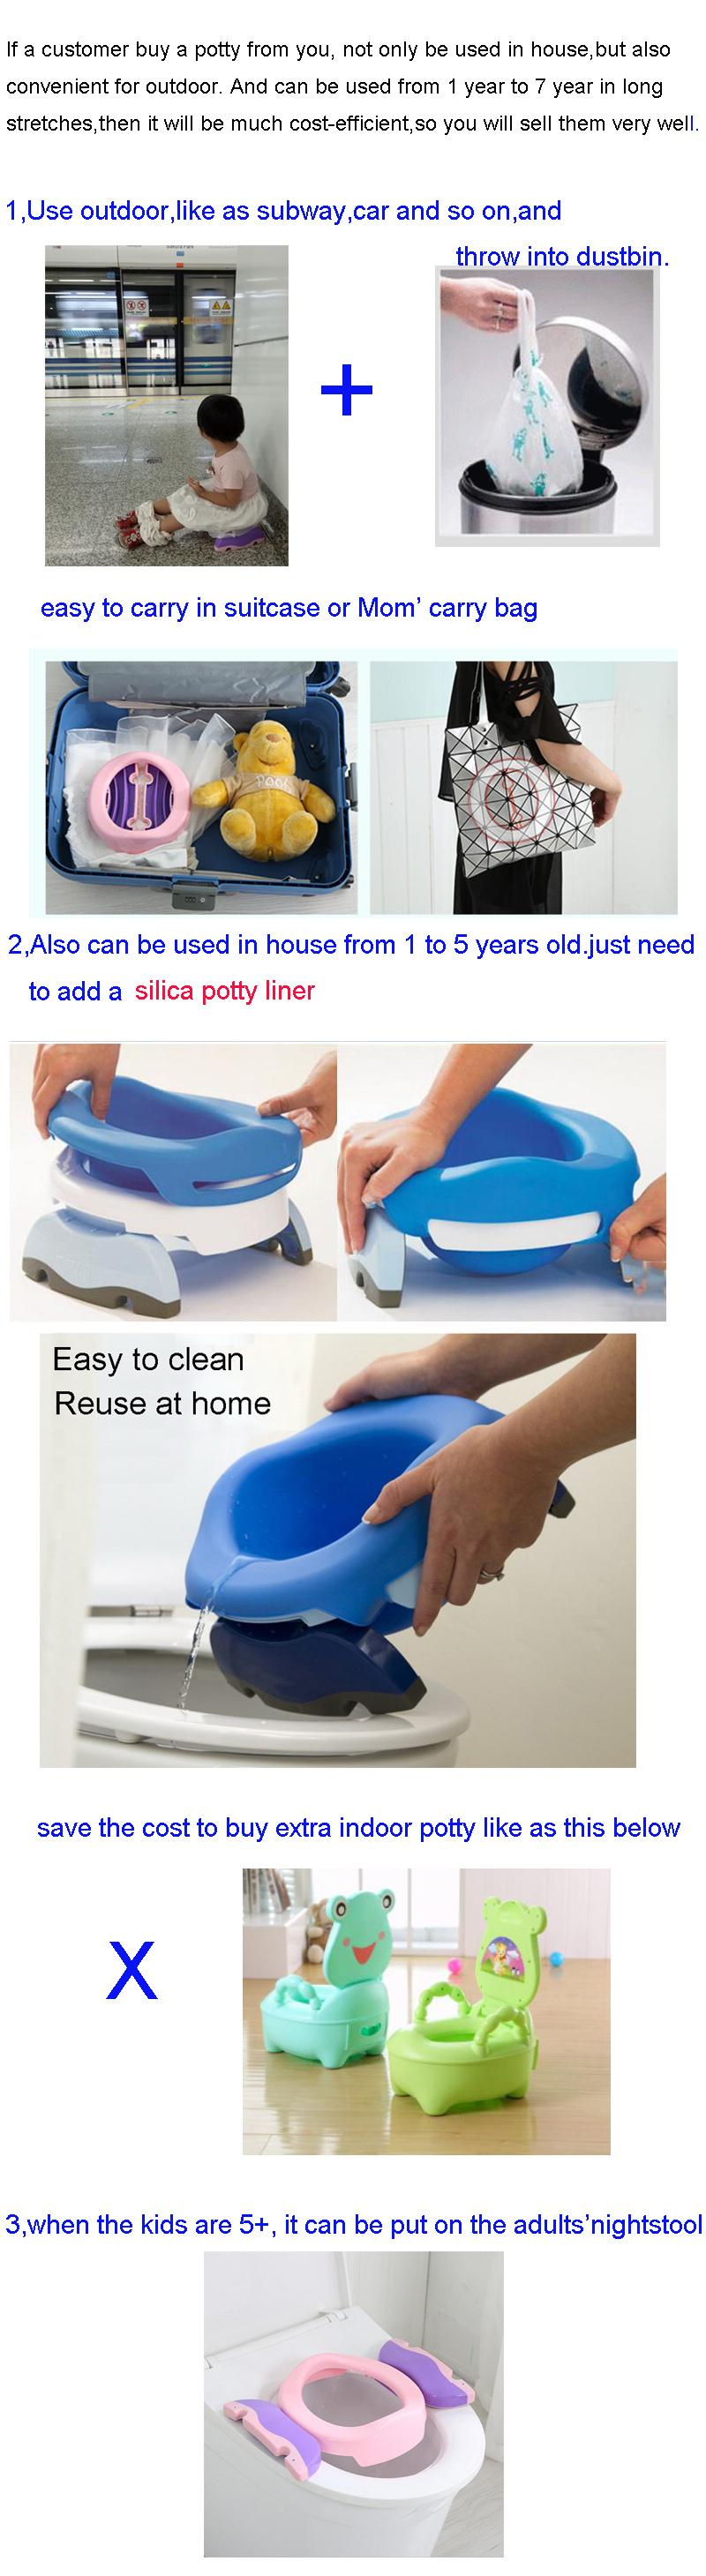 1b48876a9c4 Children Pot Kids Pee Urinal Baby Boy Urine Travel Toilet Portable Potty  Seat Baby Travel Potty Chair 2 In 1 Kids Potty Seat - Buy 2 In 1 Portable  ...